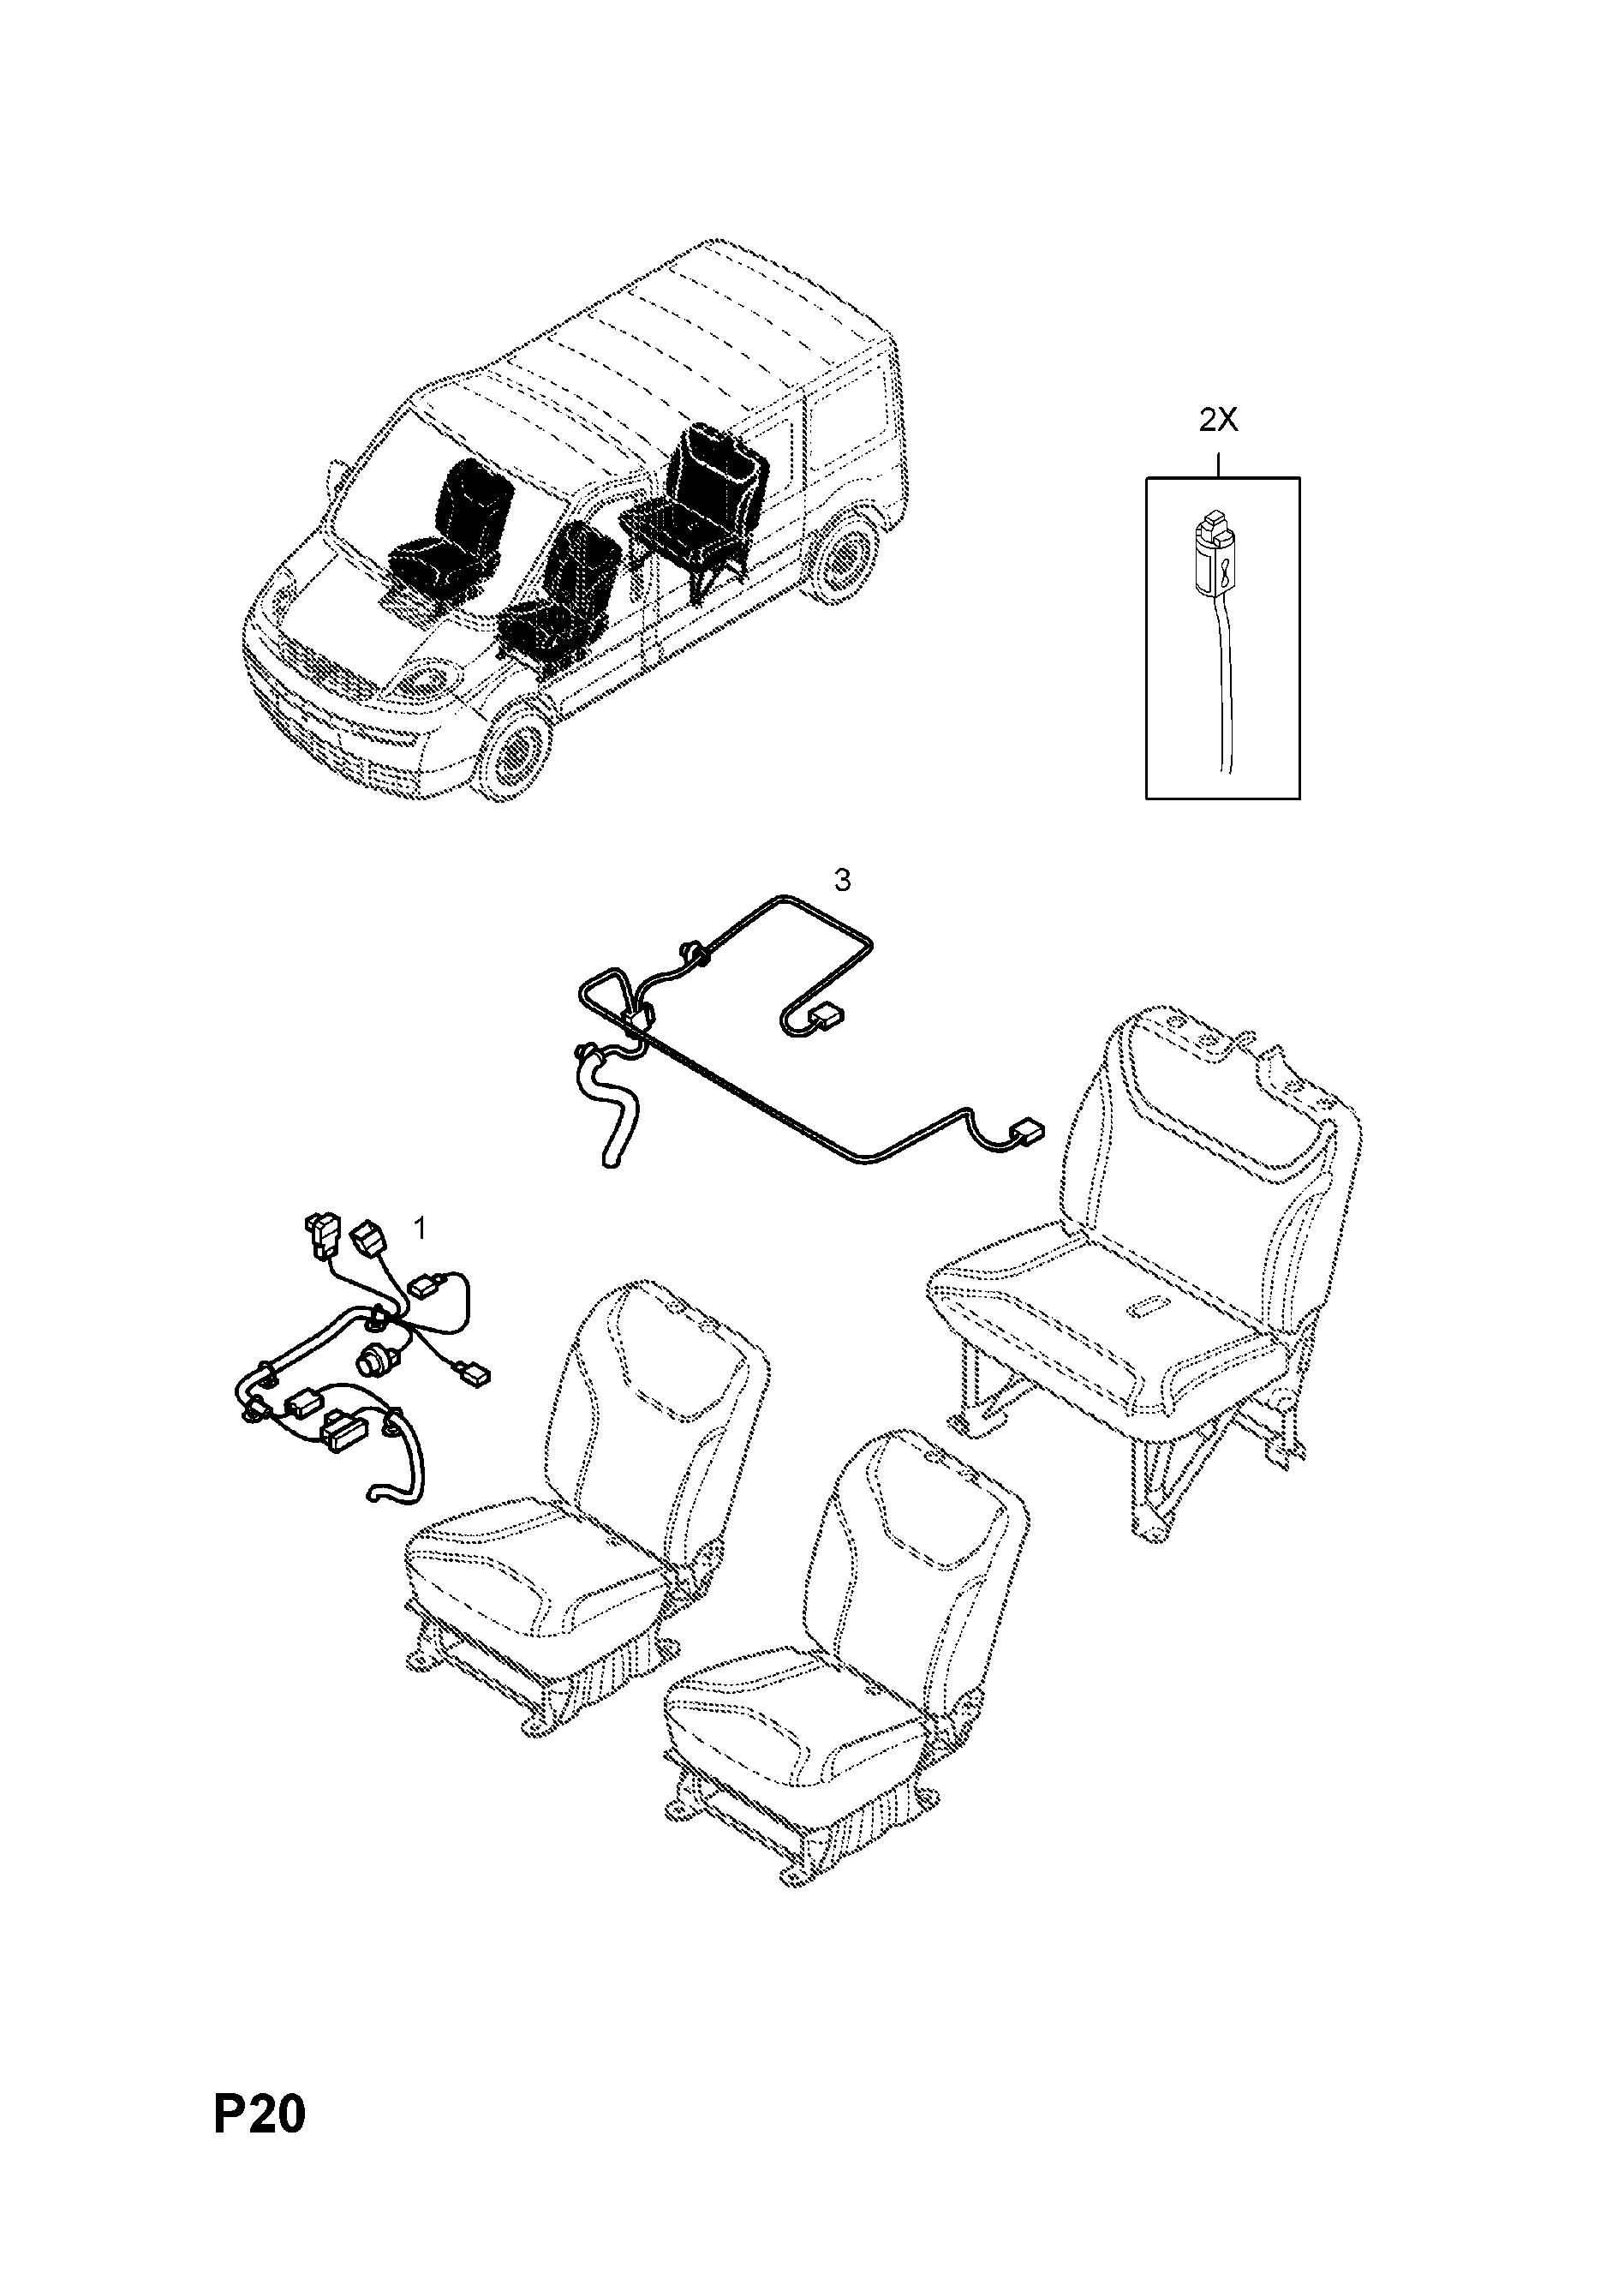 Wiring Diagram For Vauxhall Vivaro